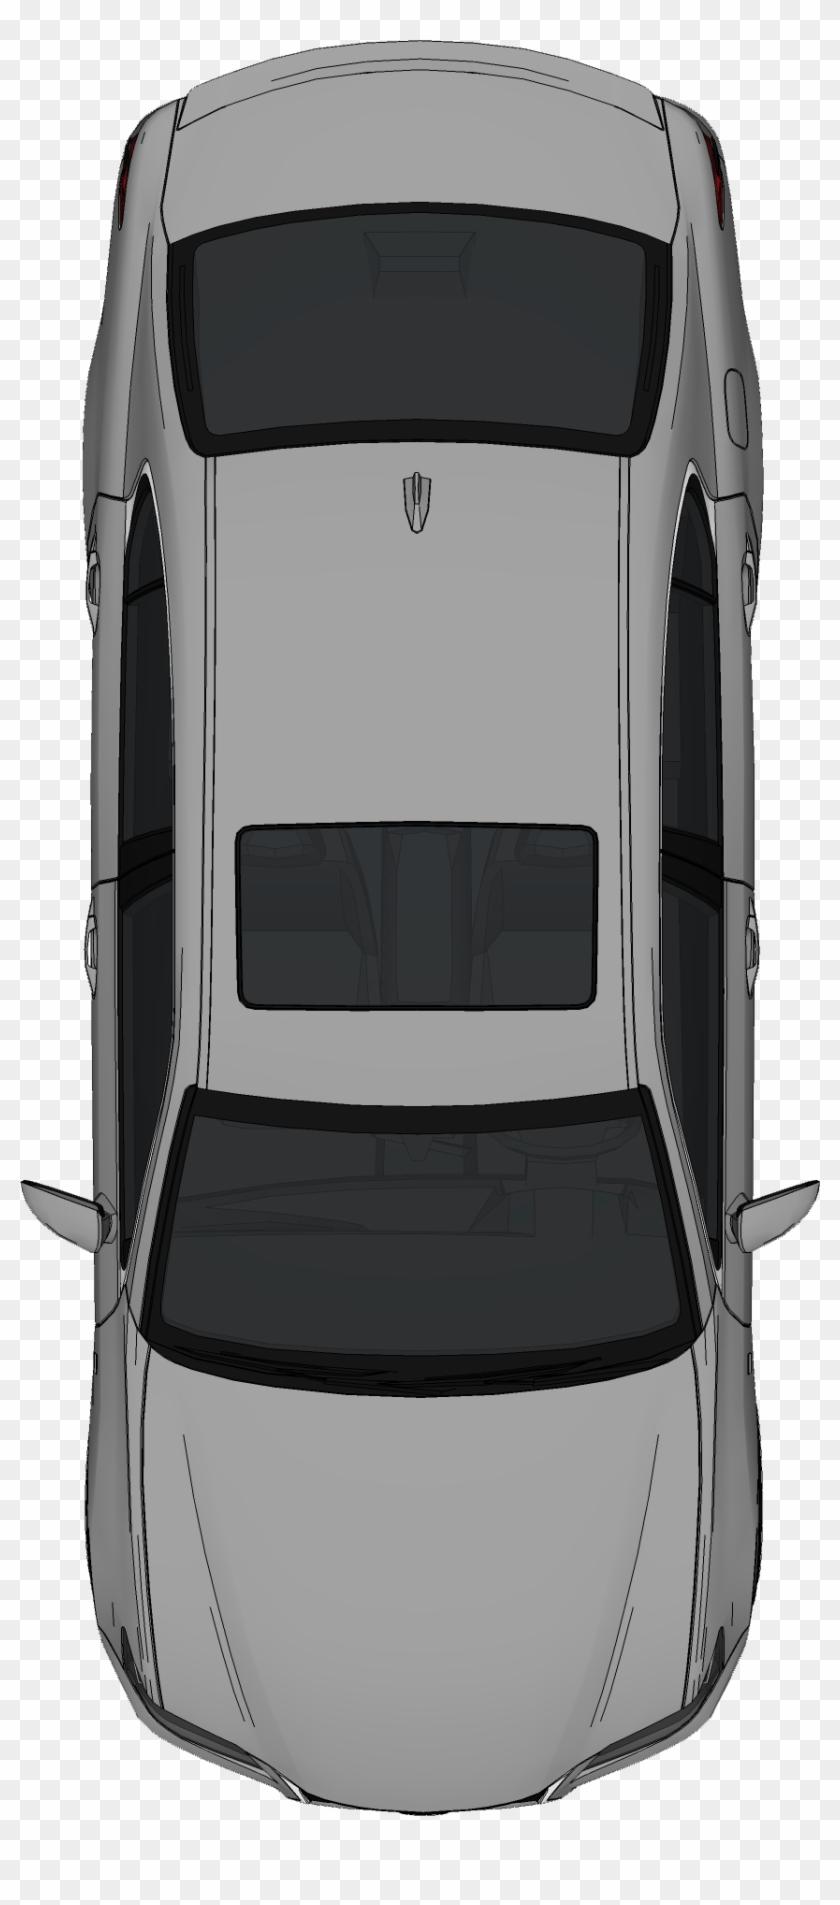 Png Cars Top View, Transparent Png.